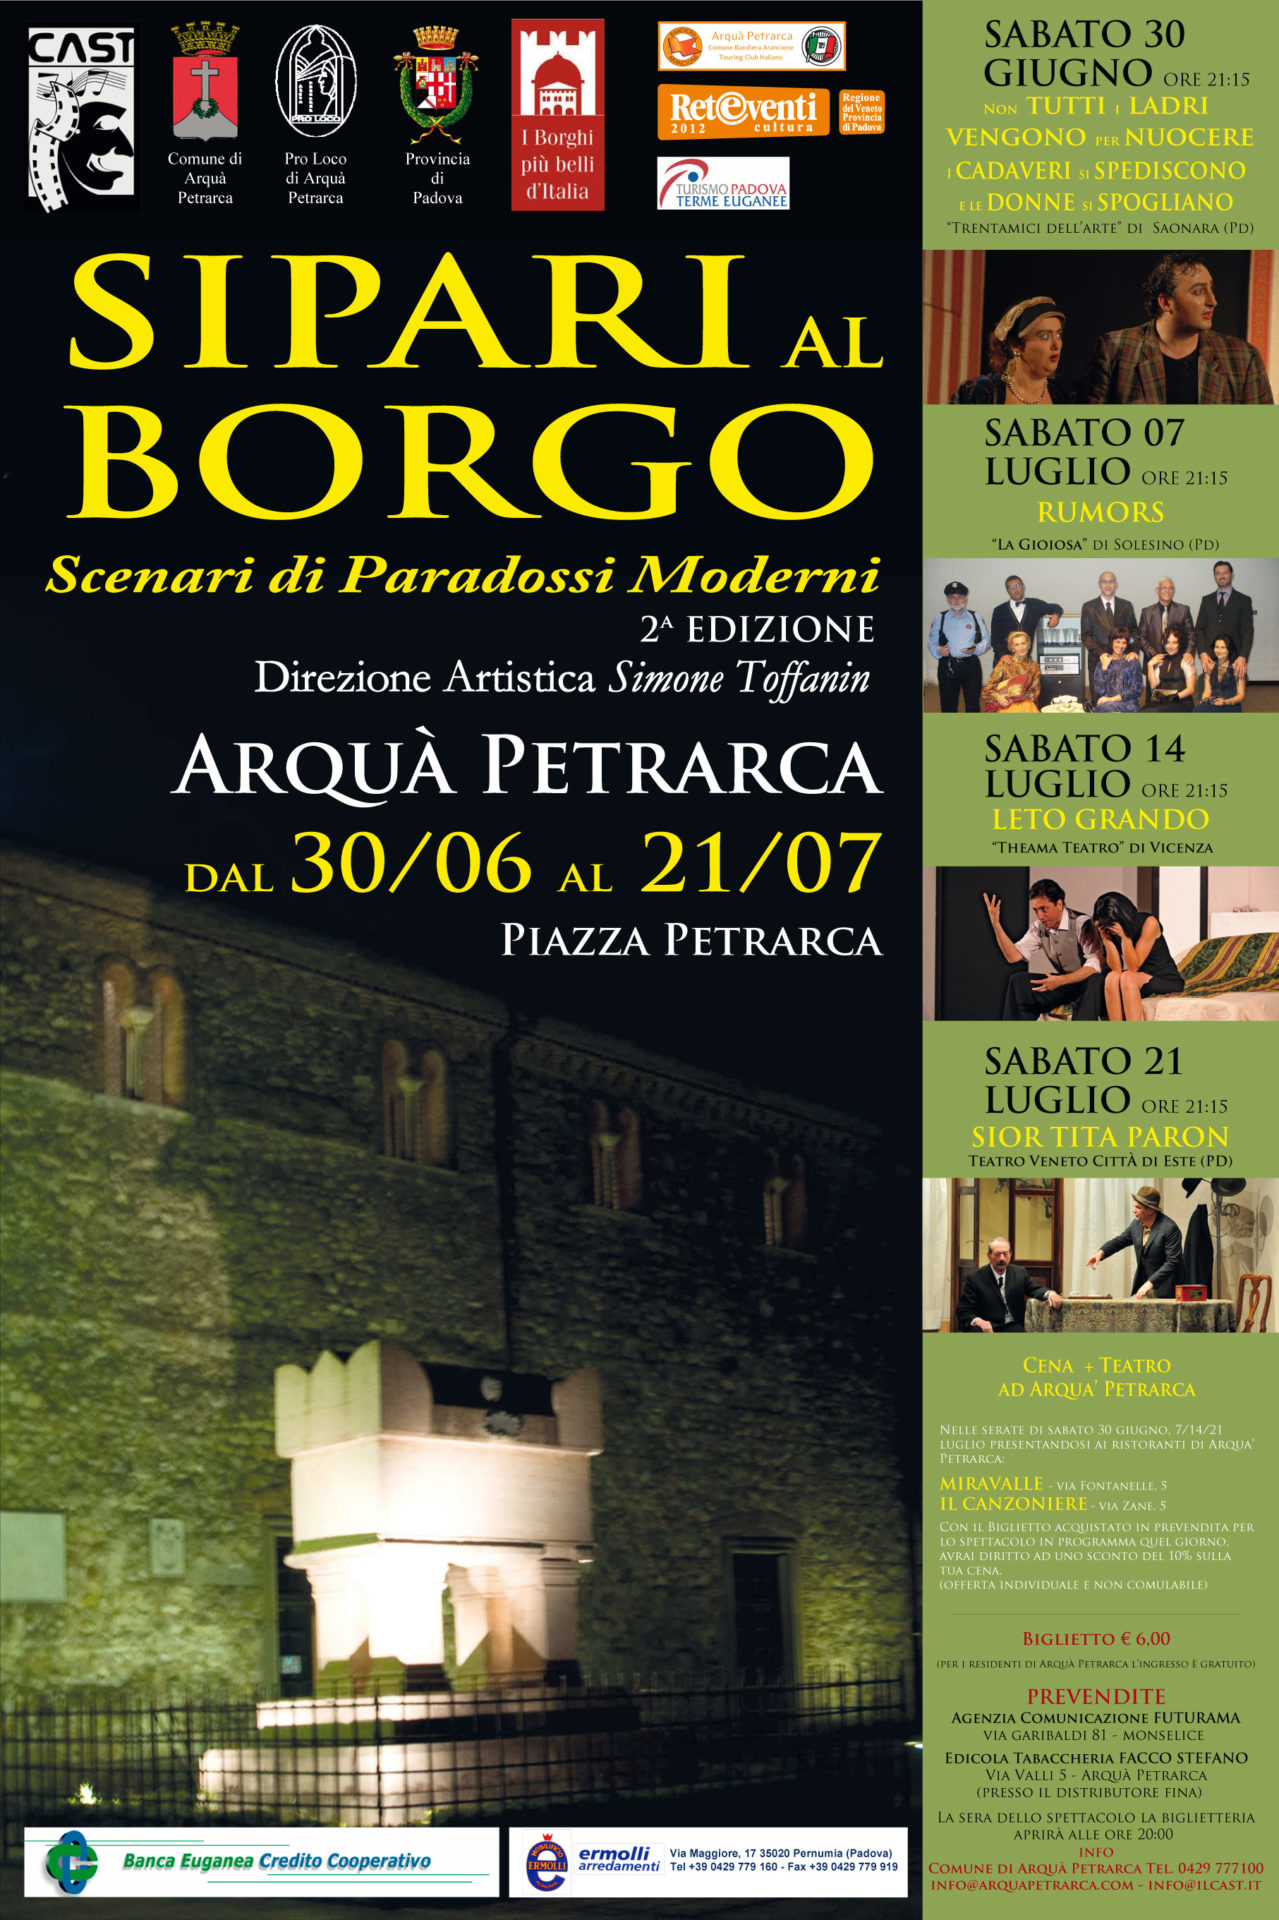 Sipari al Borgo 2012